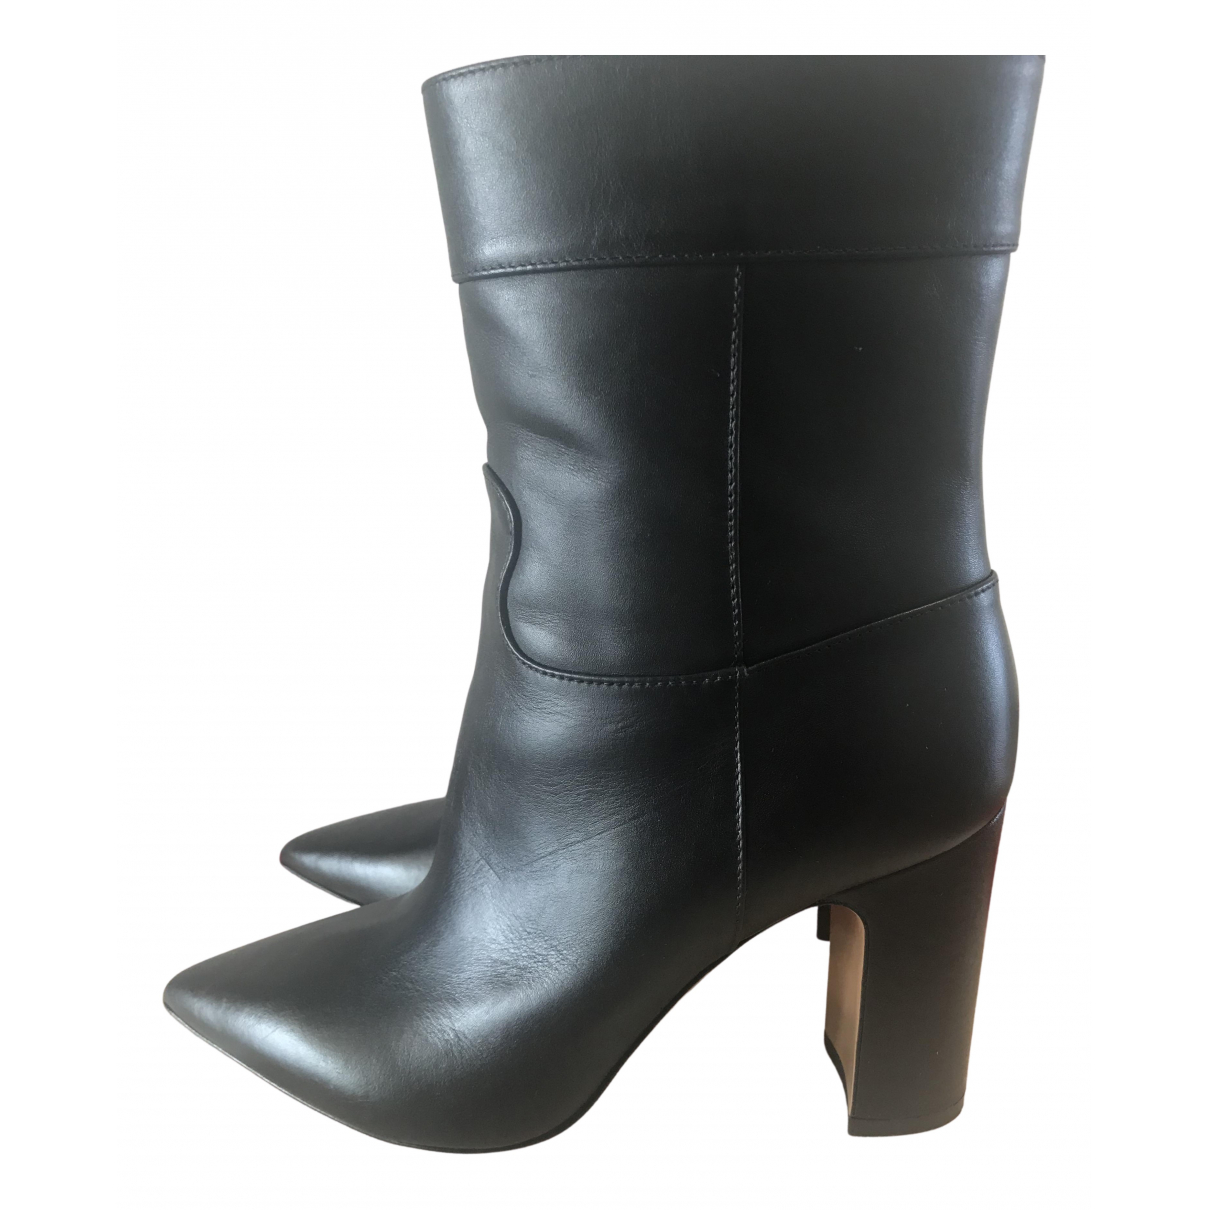 Valentino Garavani N Black Leather Ankle boots for Women 38 EU